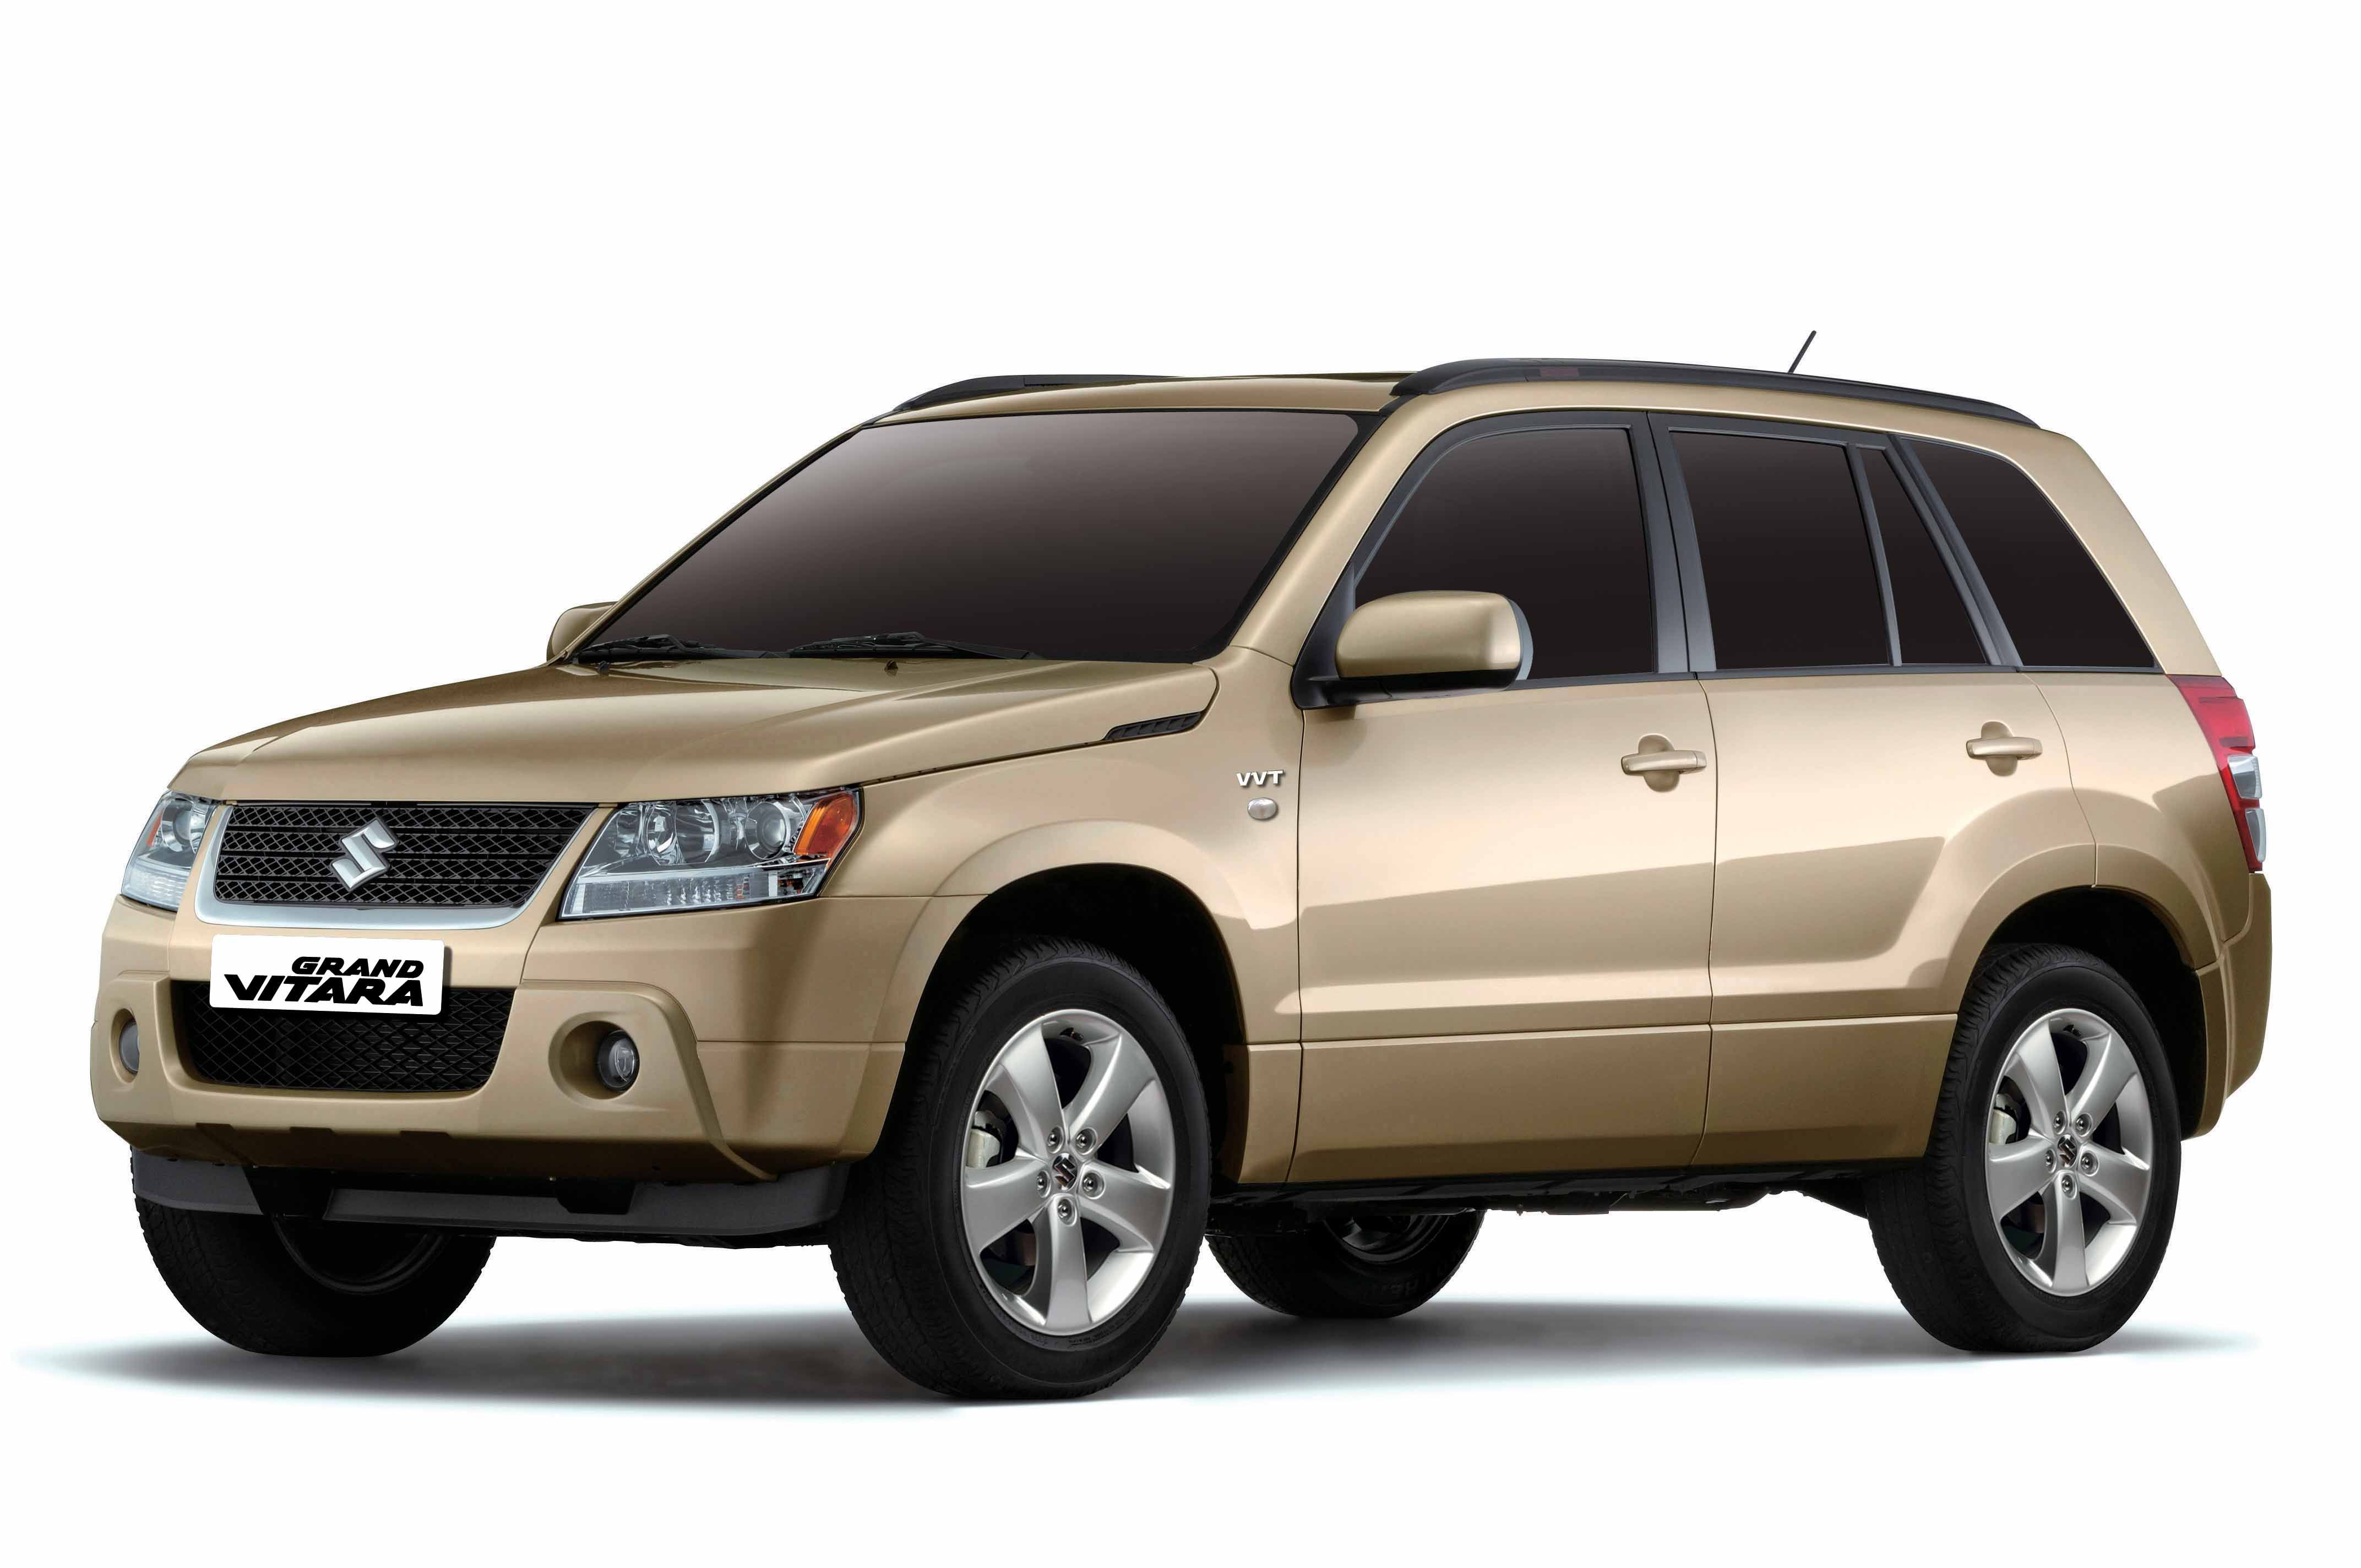 maruti suzuki launched   advanced variant   suv grand vitara  india   model